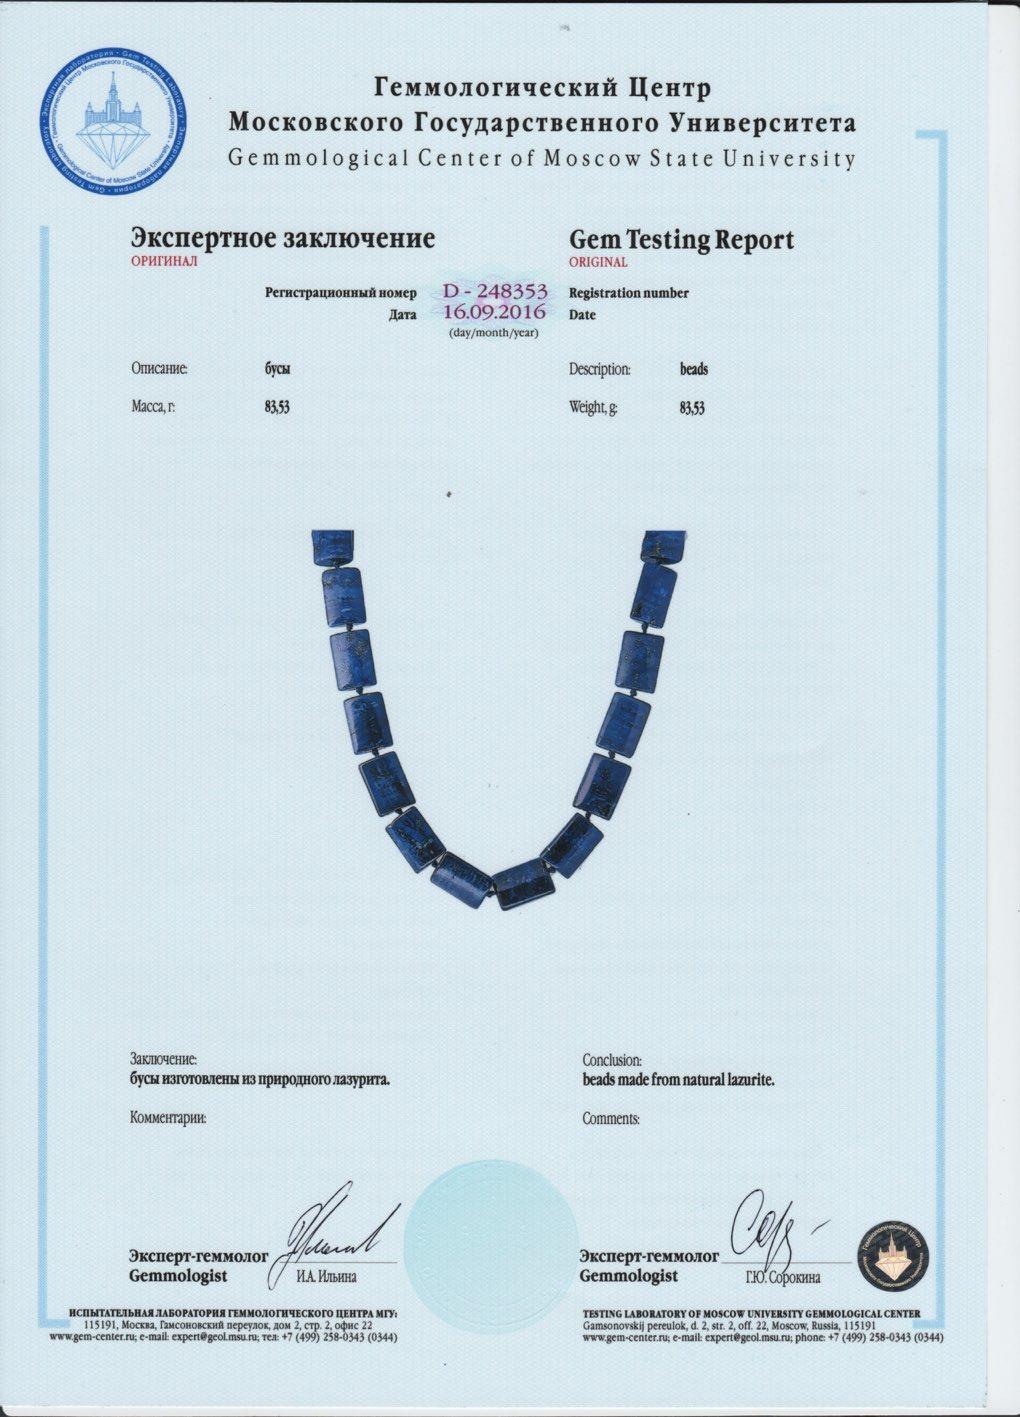 https://mineralmarket.ru/img/certificate/64/1485964185.jpeg